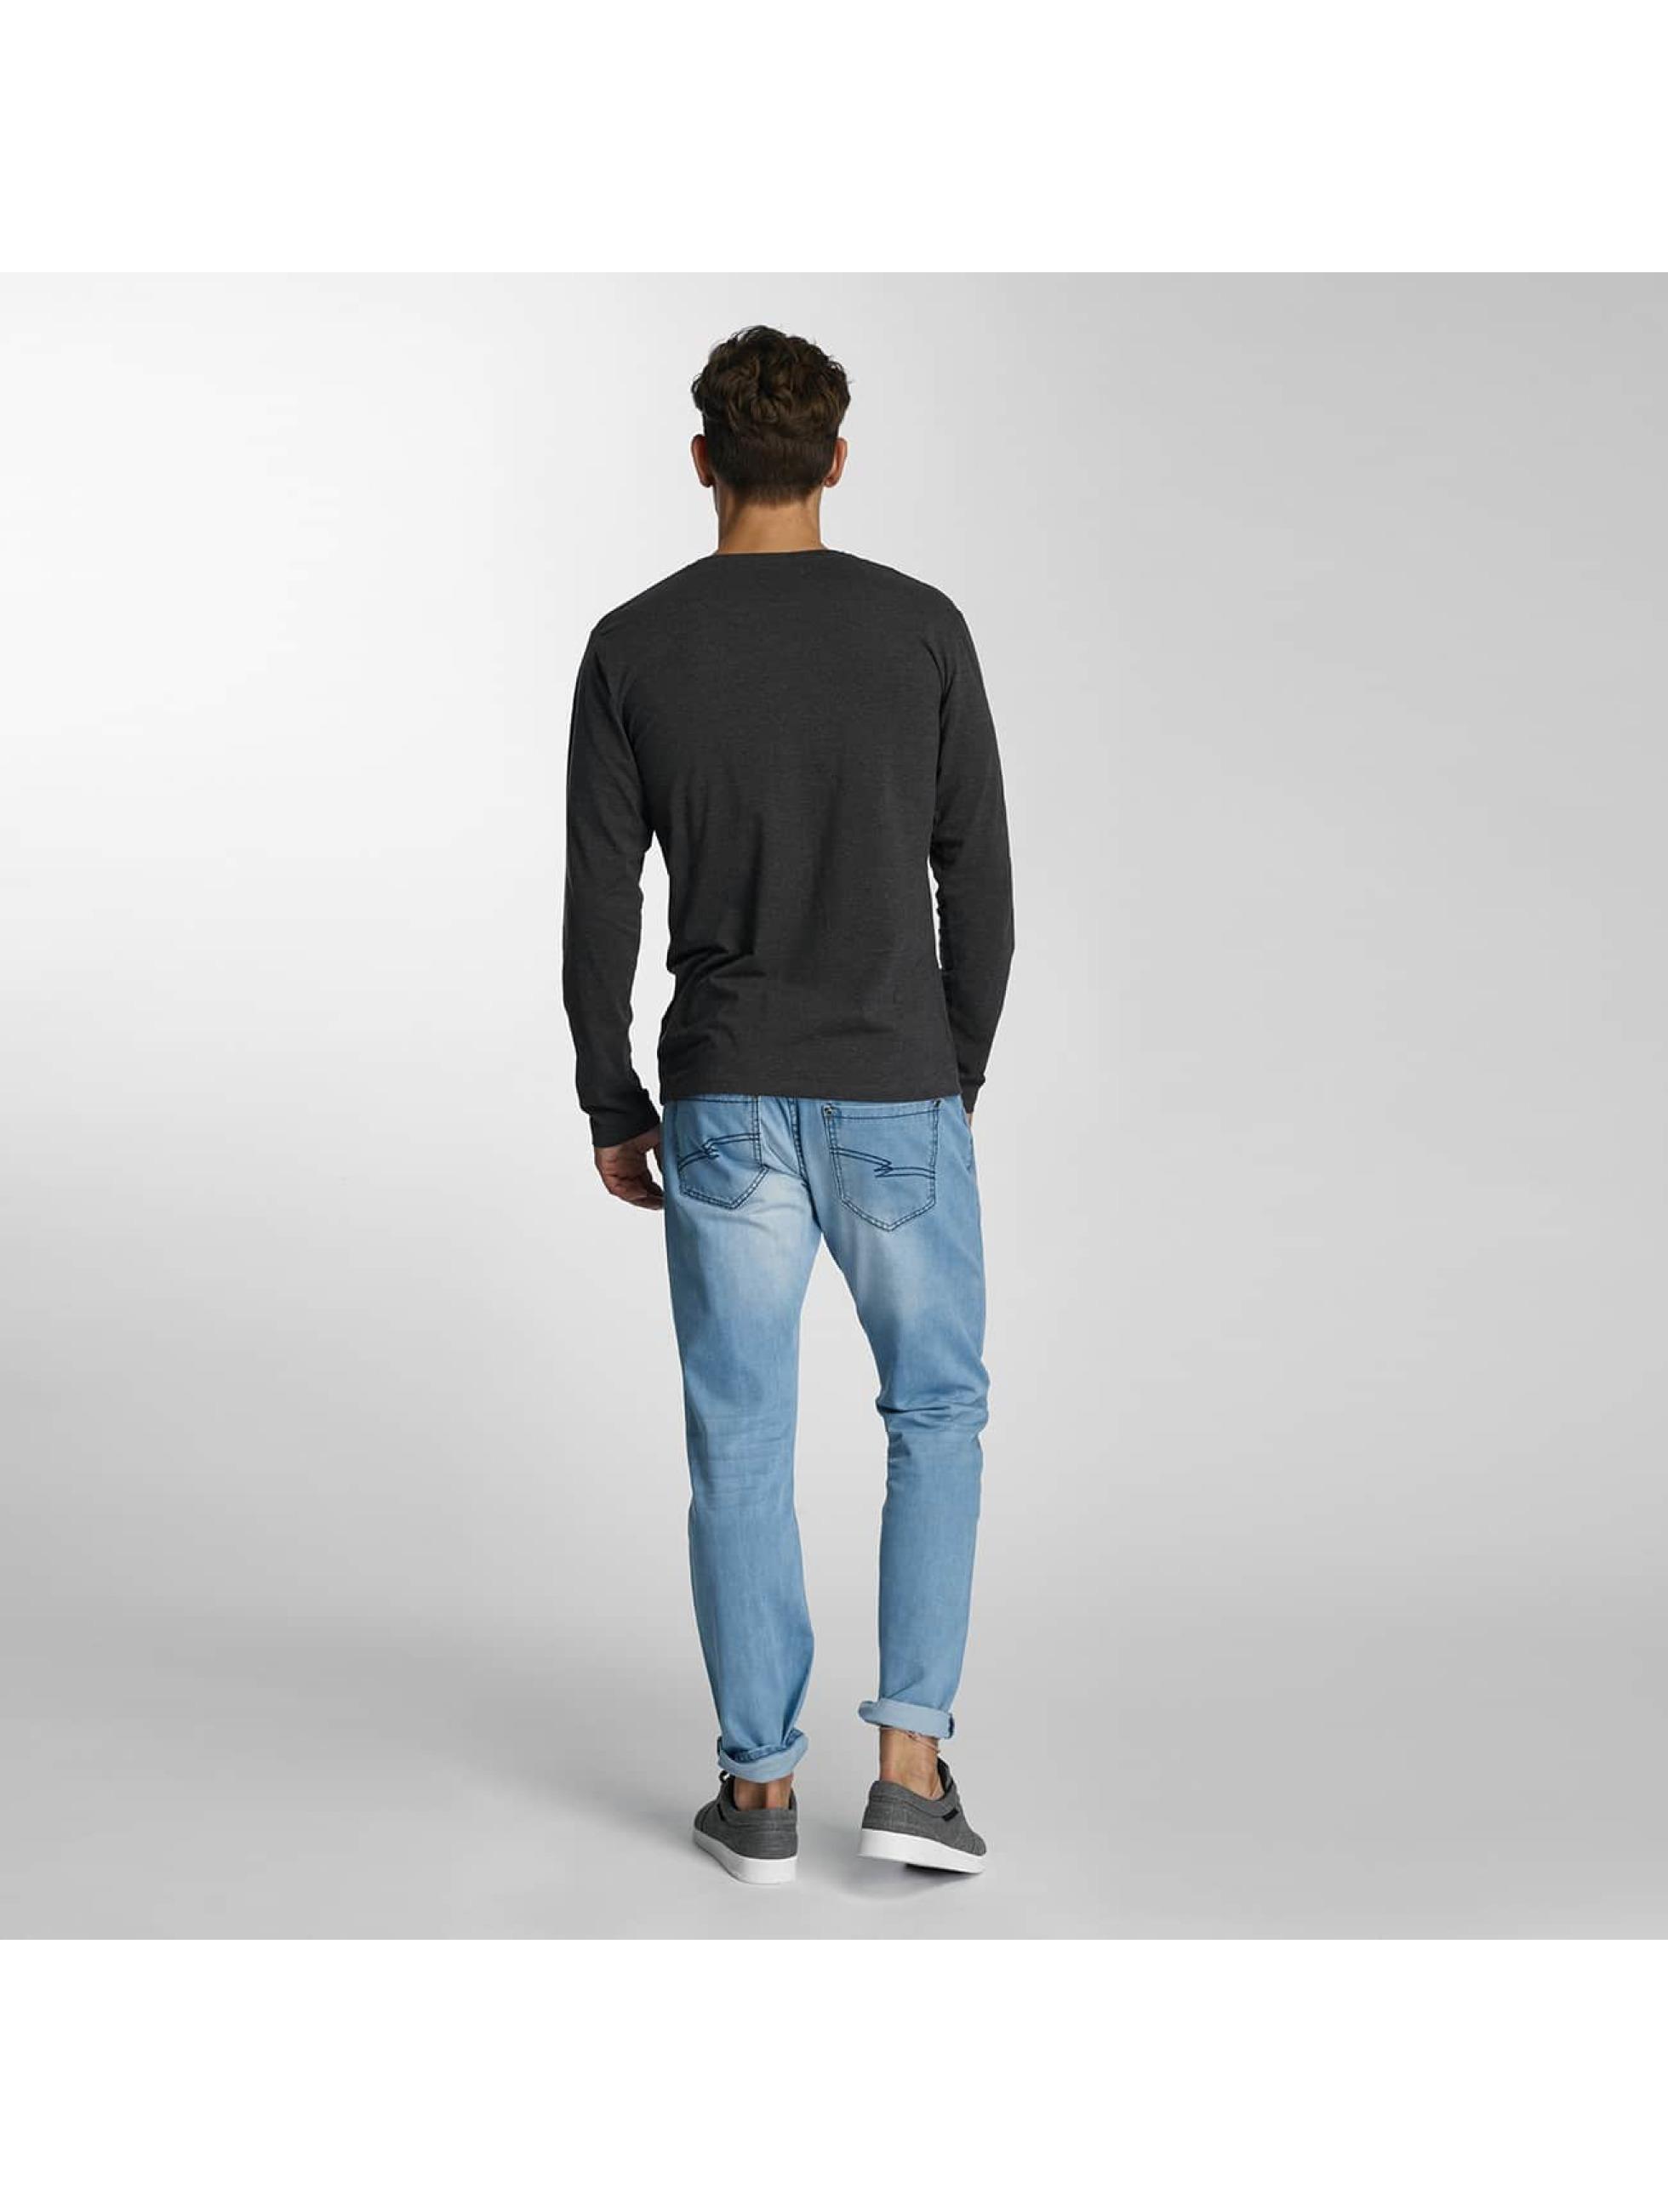 Paris Premium Langermet Basic Longsleeve grå